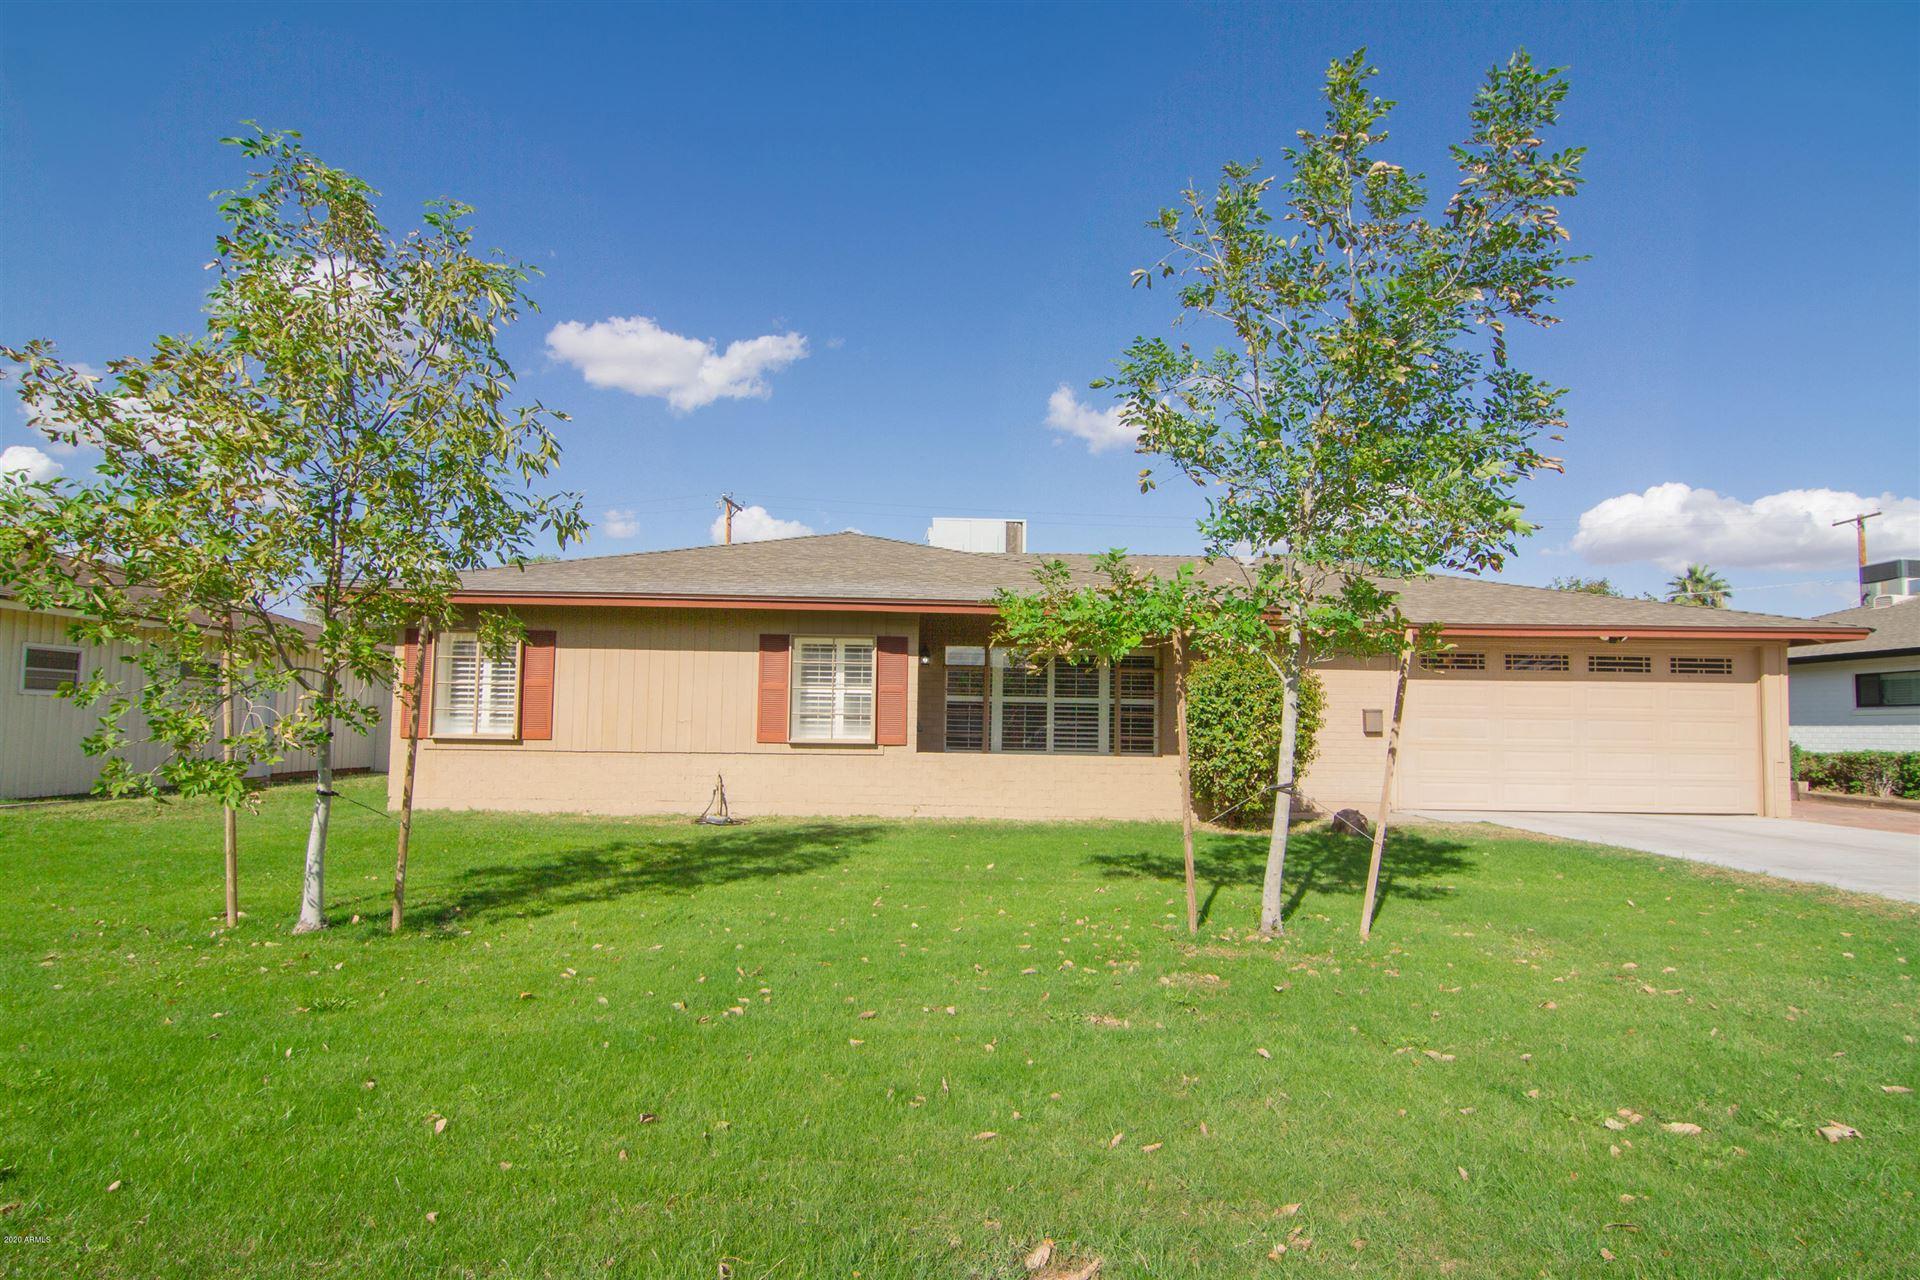 4702 E WINDSOR Avenue, Phoenix, AZ 85008 - MLS#: 6158606